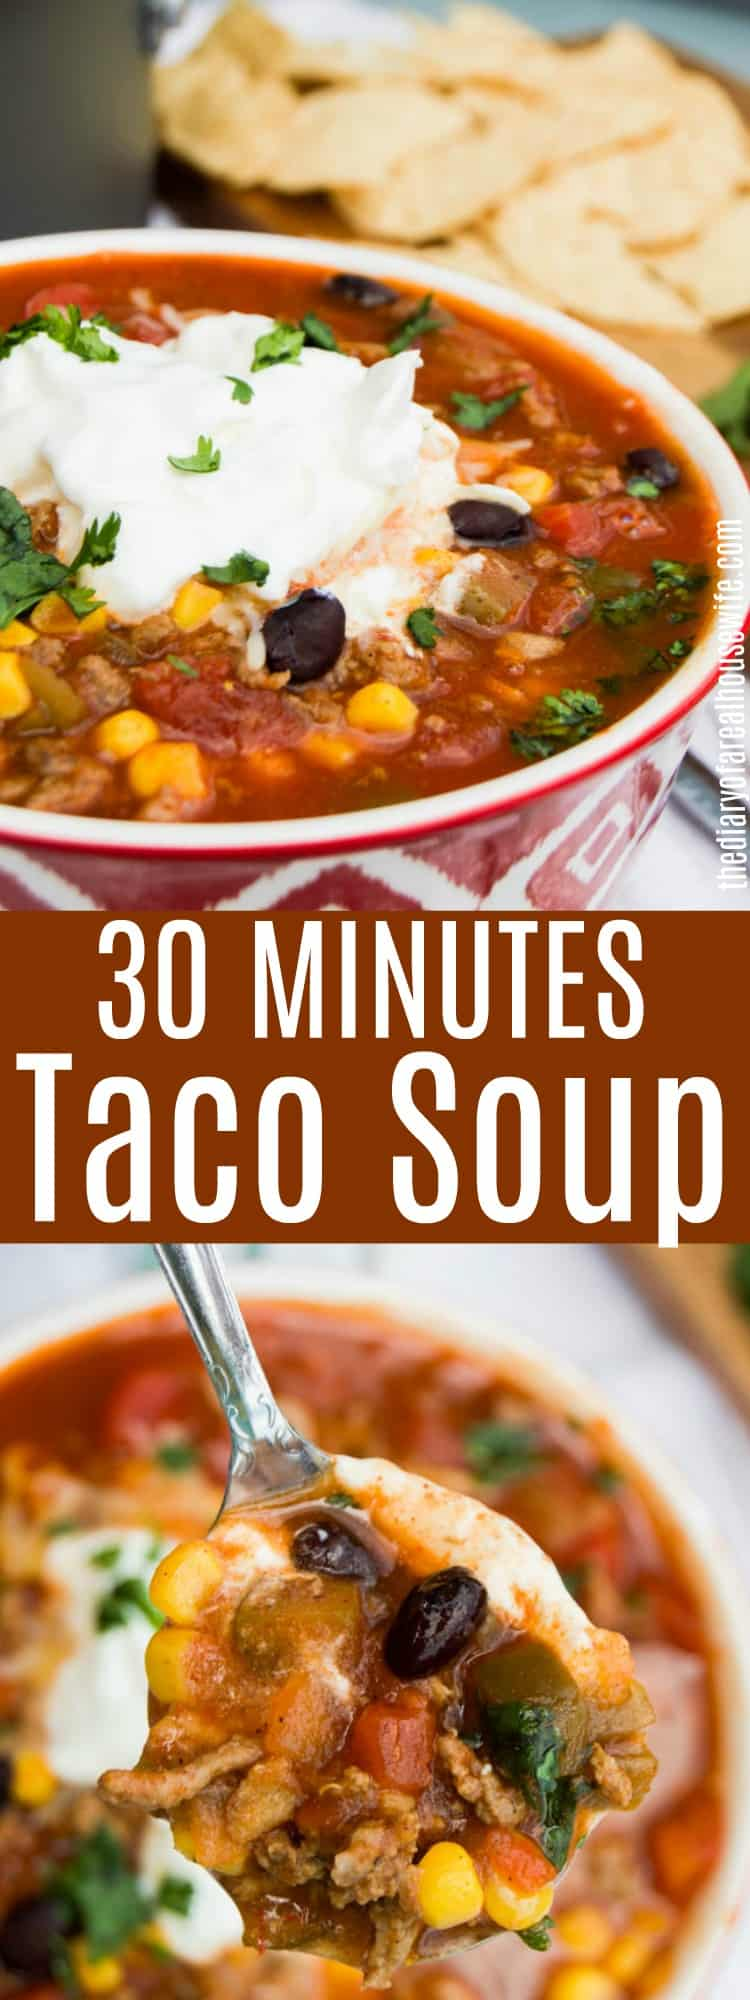 30 Minutes Taco Soup